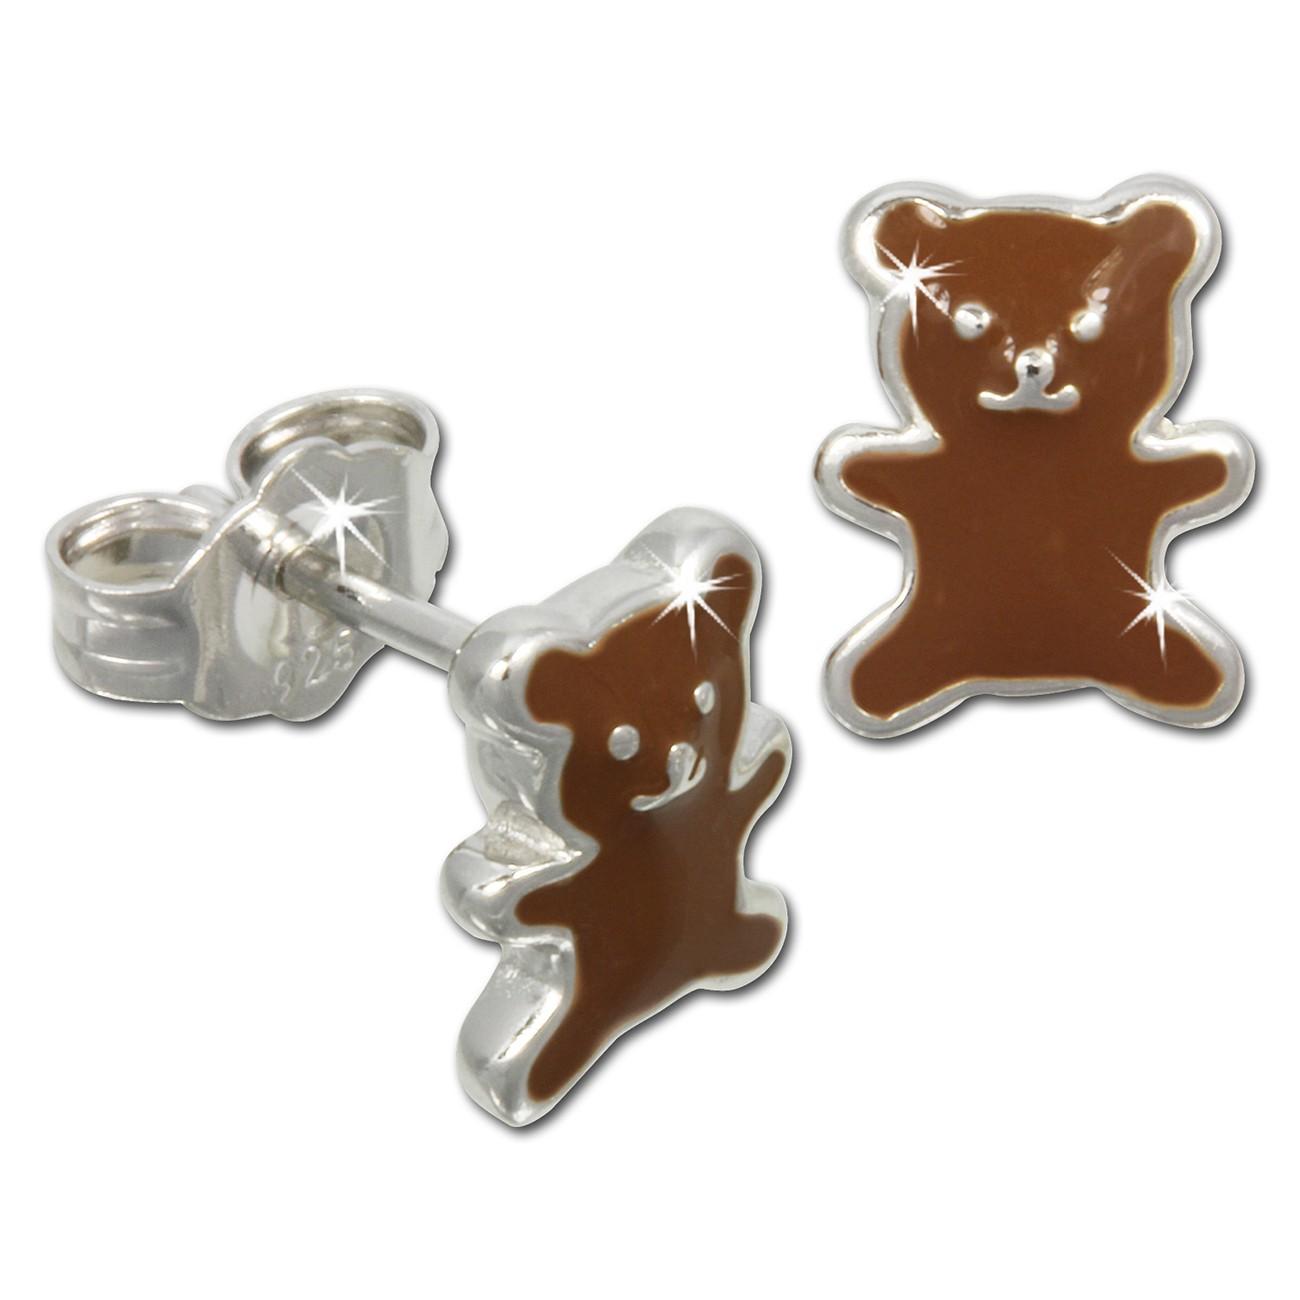 Kinder Ohrring Teddy braun Silber Ohrstecker Kinderschmuck TW SDO610N